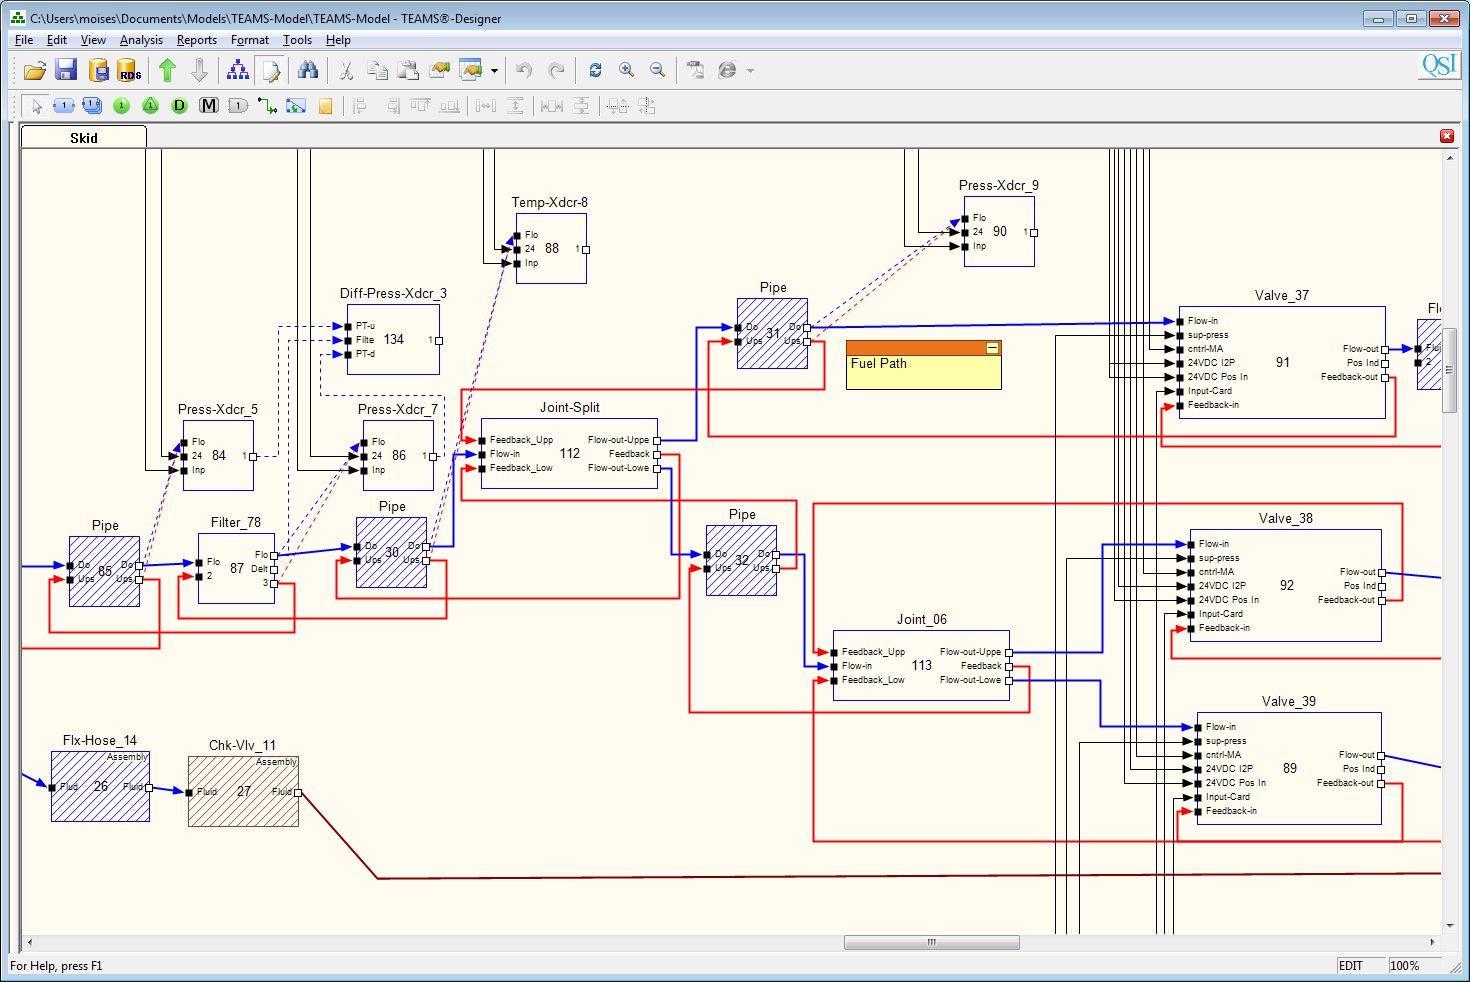 TEAMS-Designer Graphical User Interface